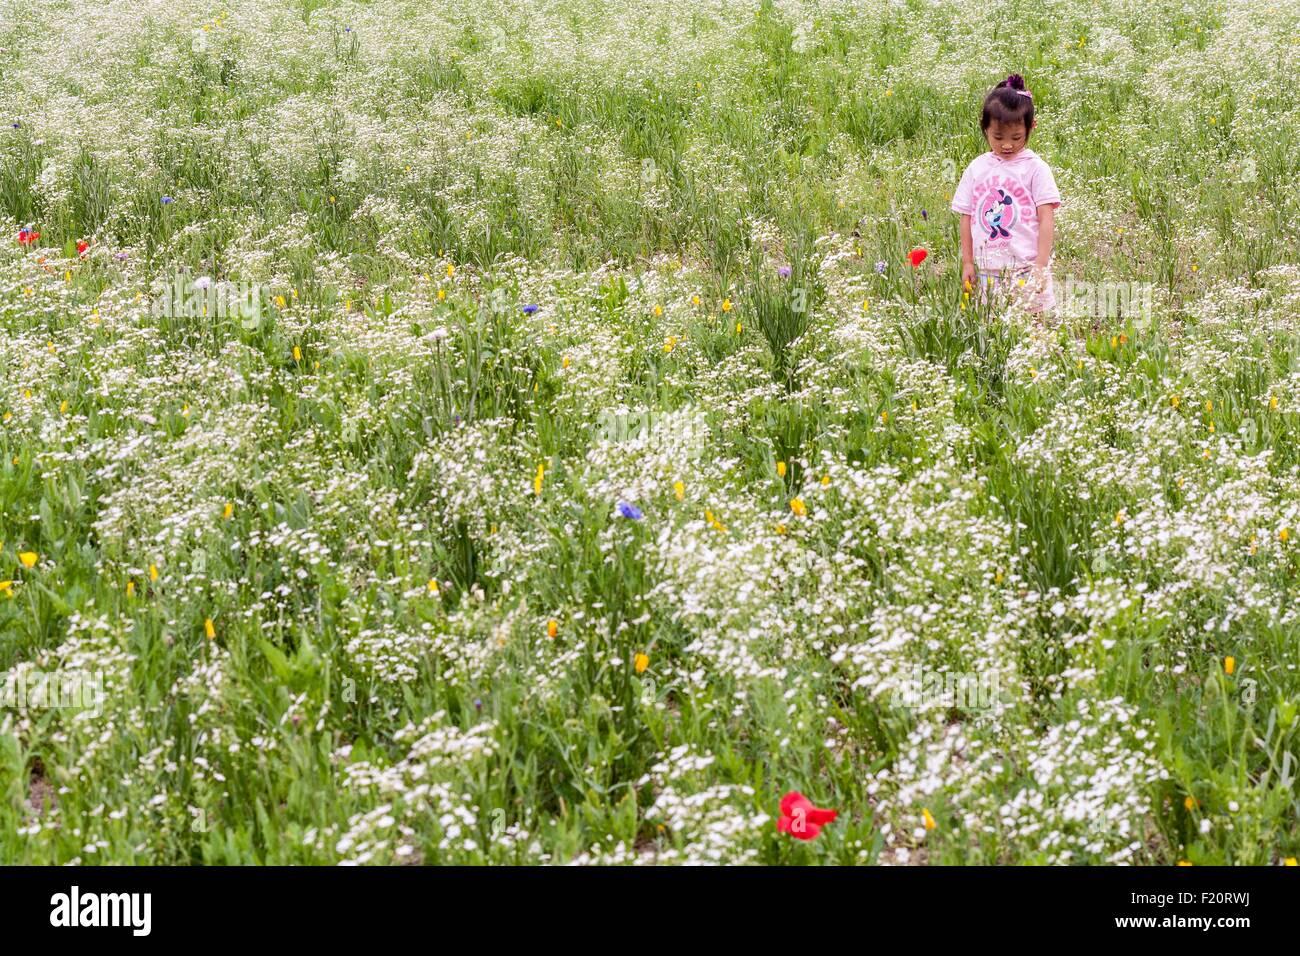 South Korea, Seoul, Songpa-gu, Olympic Park (Olpark), Olympic park built for the 1988 Olympics, flower field - Stock Image